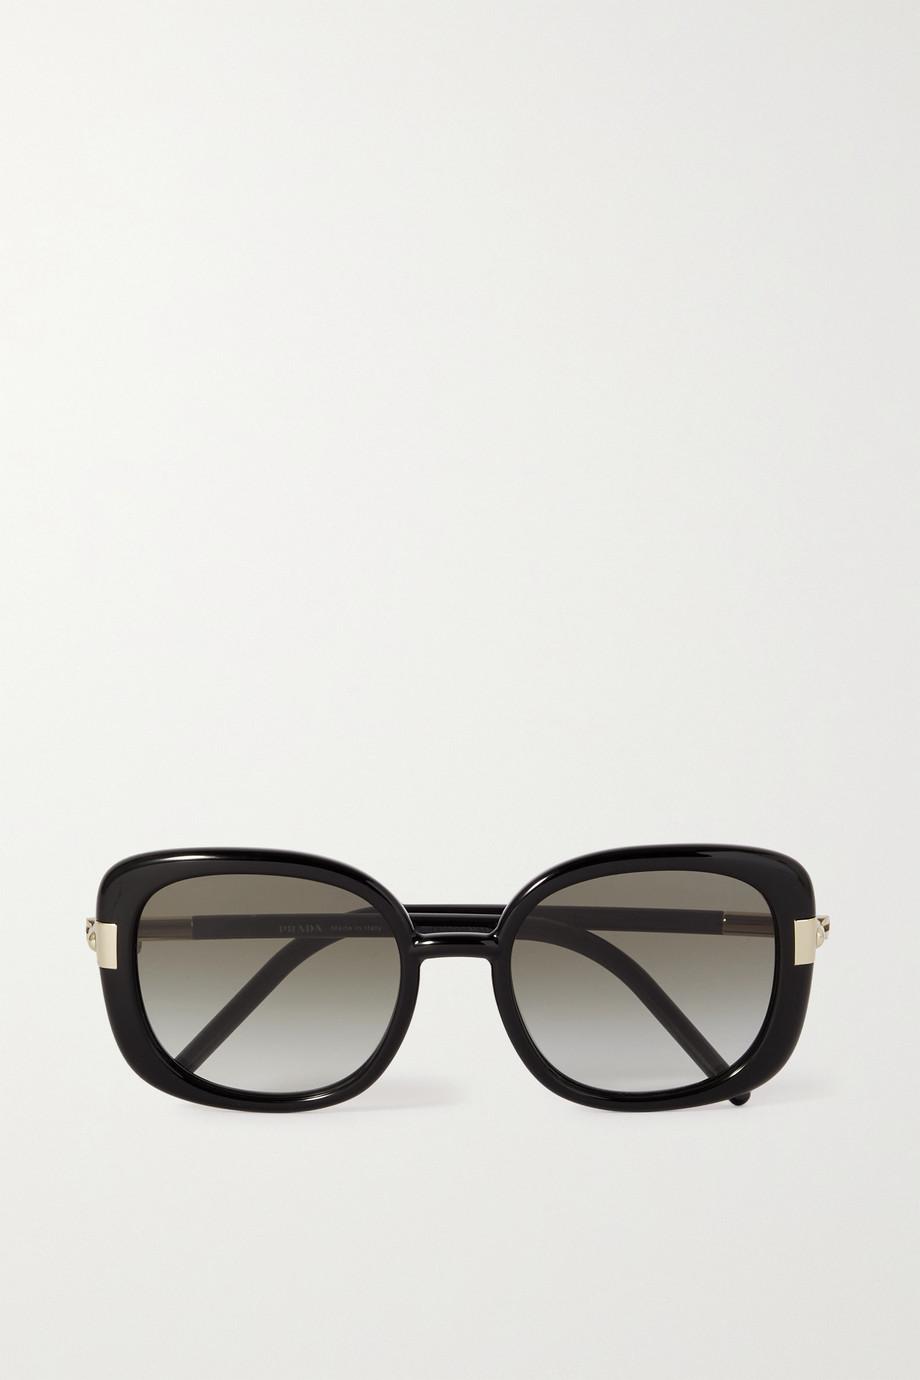 Prada Eyewear Square-frame acetate and gold-tone sunglasses